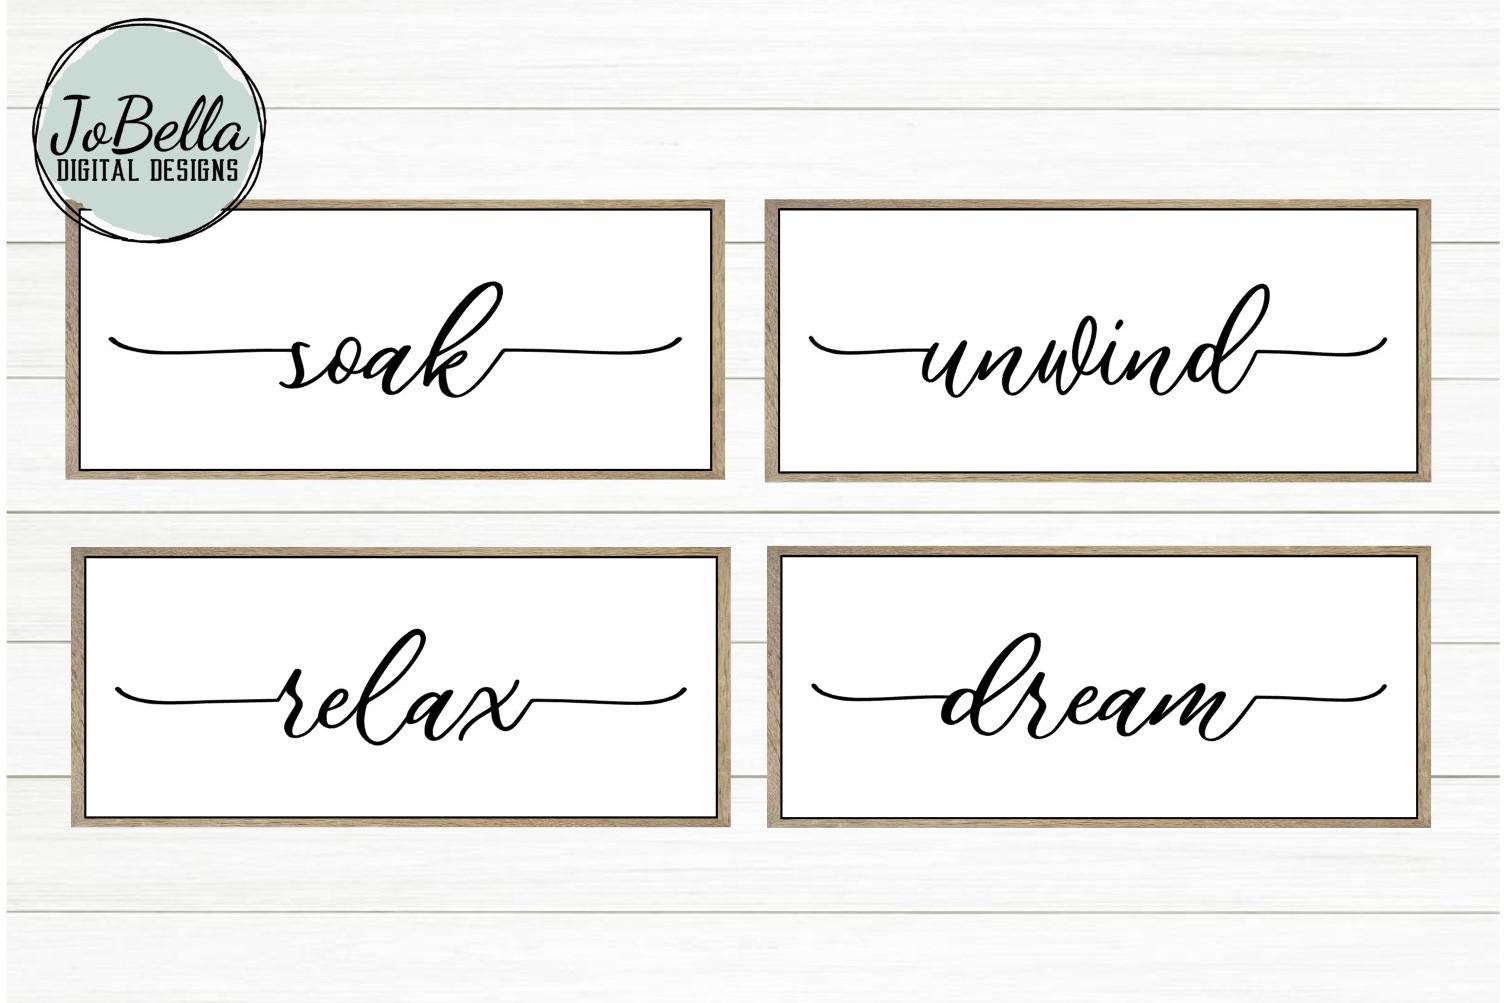 Soak Unwind Relax Dream Bathroom SVG and Printable Designs example image 1